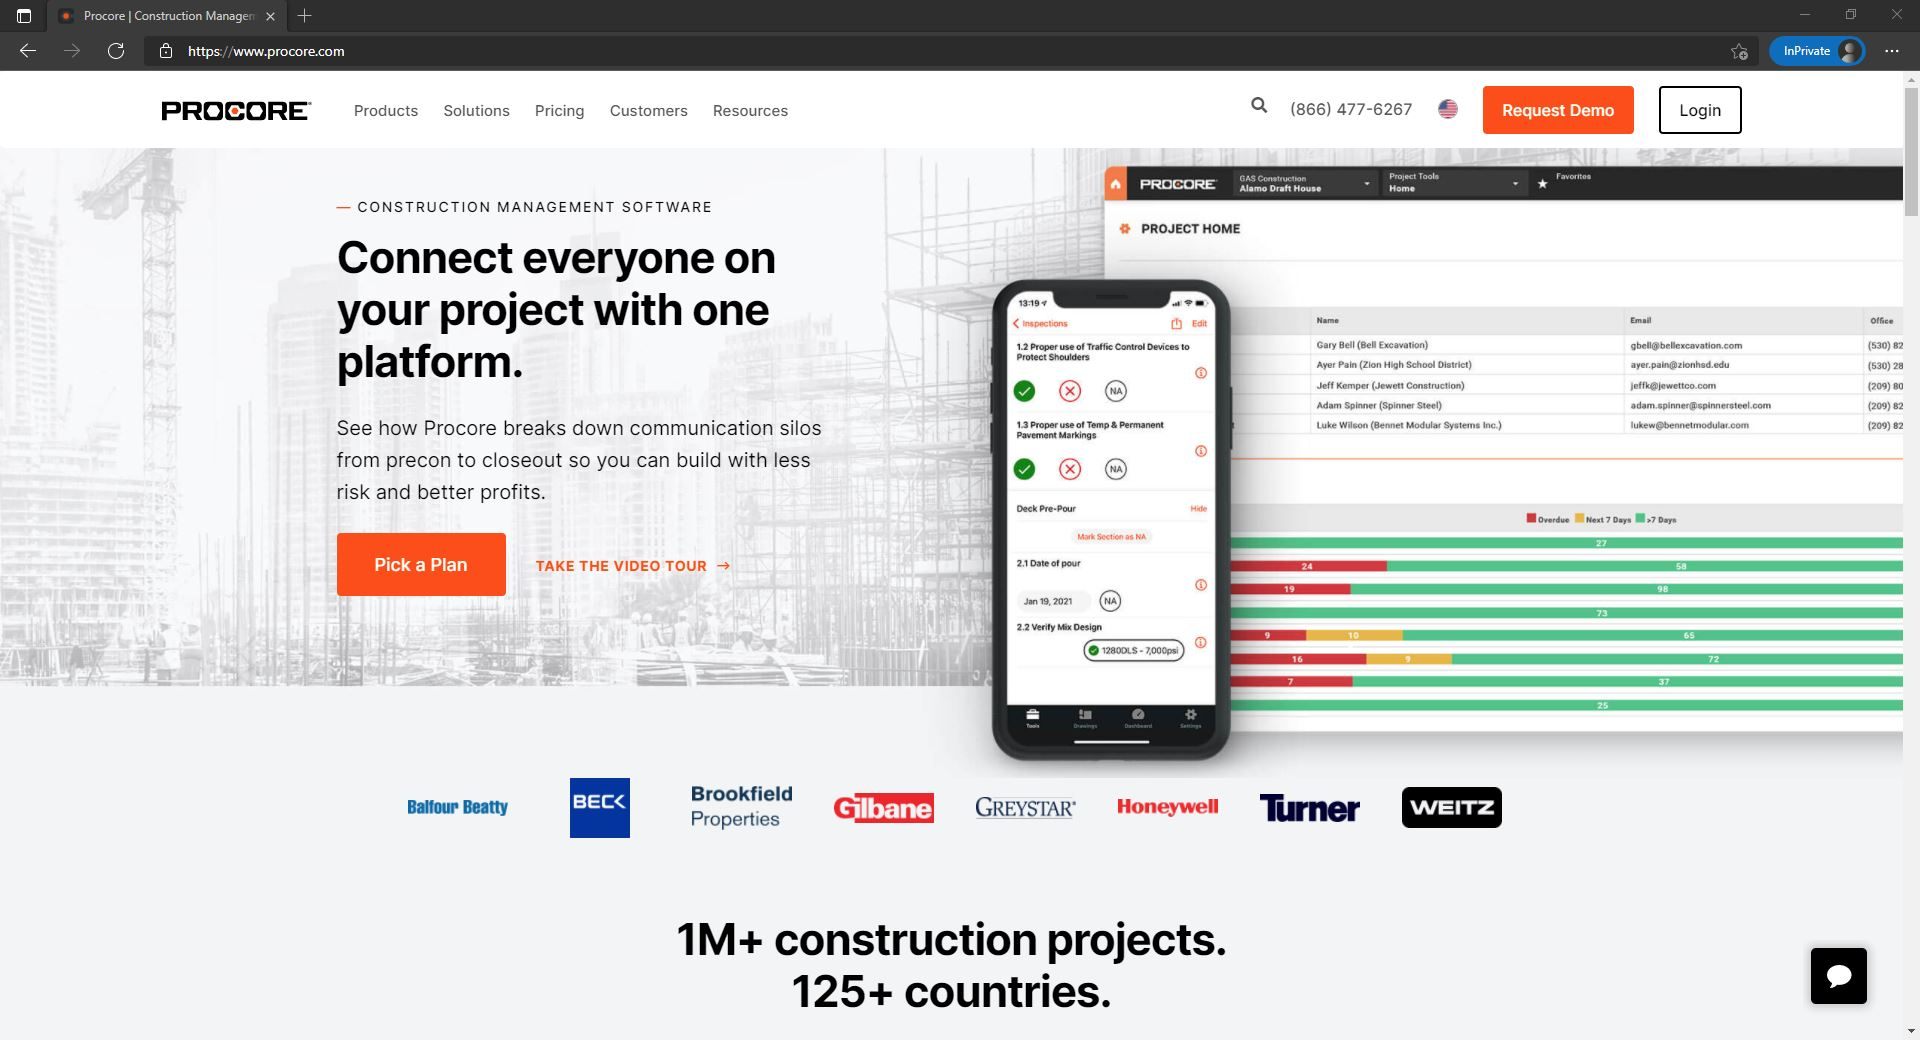 Procore website homepage